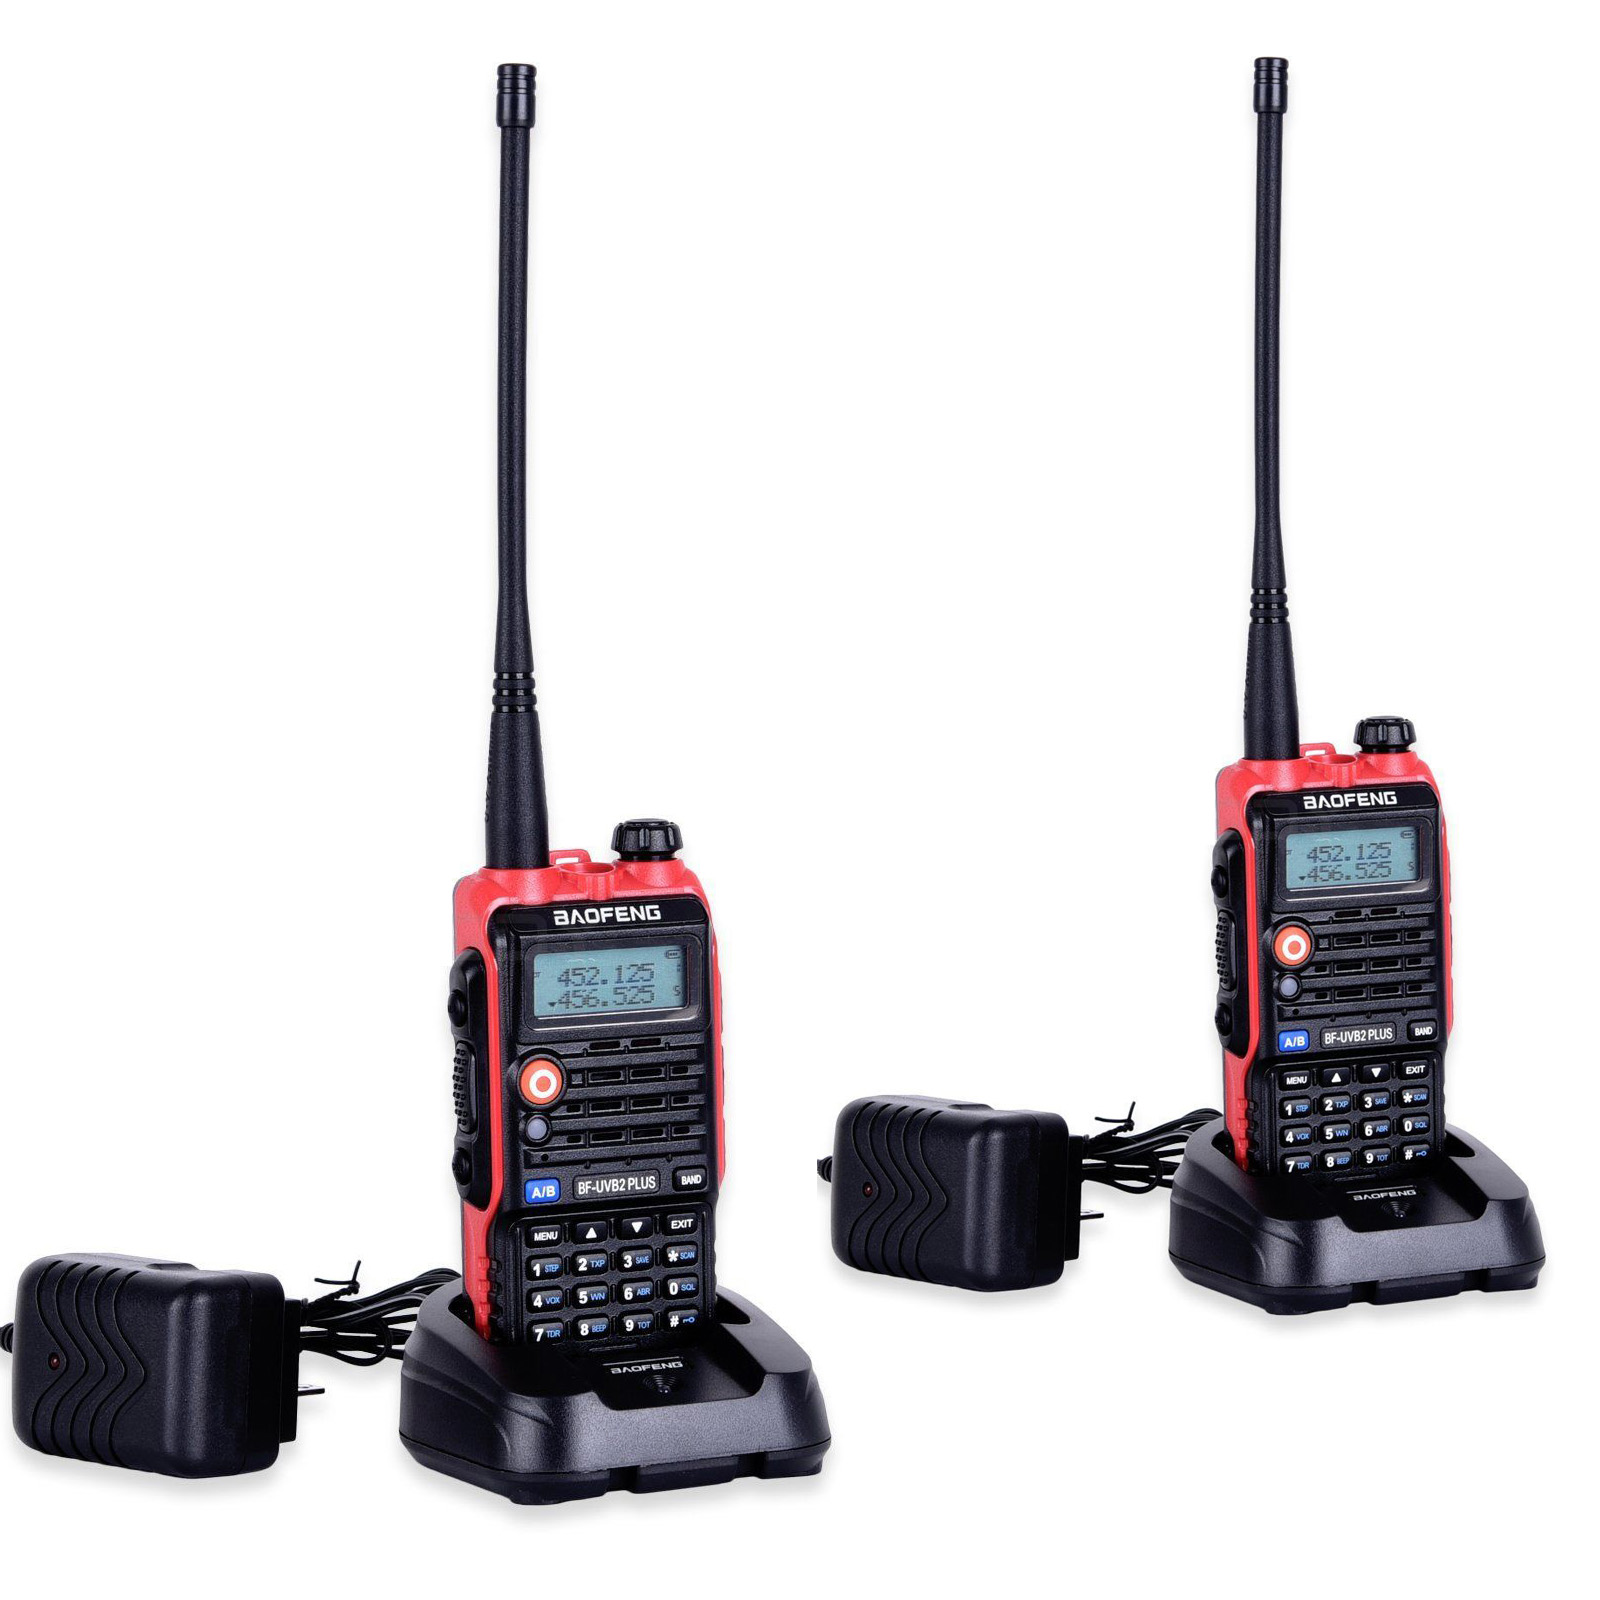 2PCS LED Light 4800mah Battery Bf Uvb2 Baofeng Uvb2 Plus For WalkieTalkie Cb Radio Mobile Comunicador